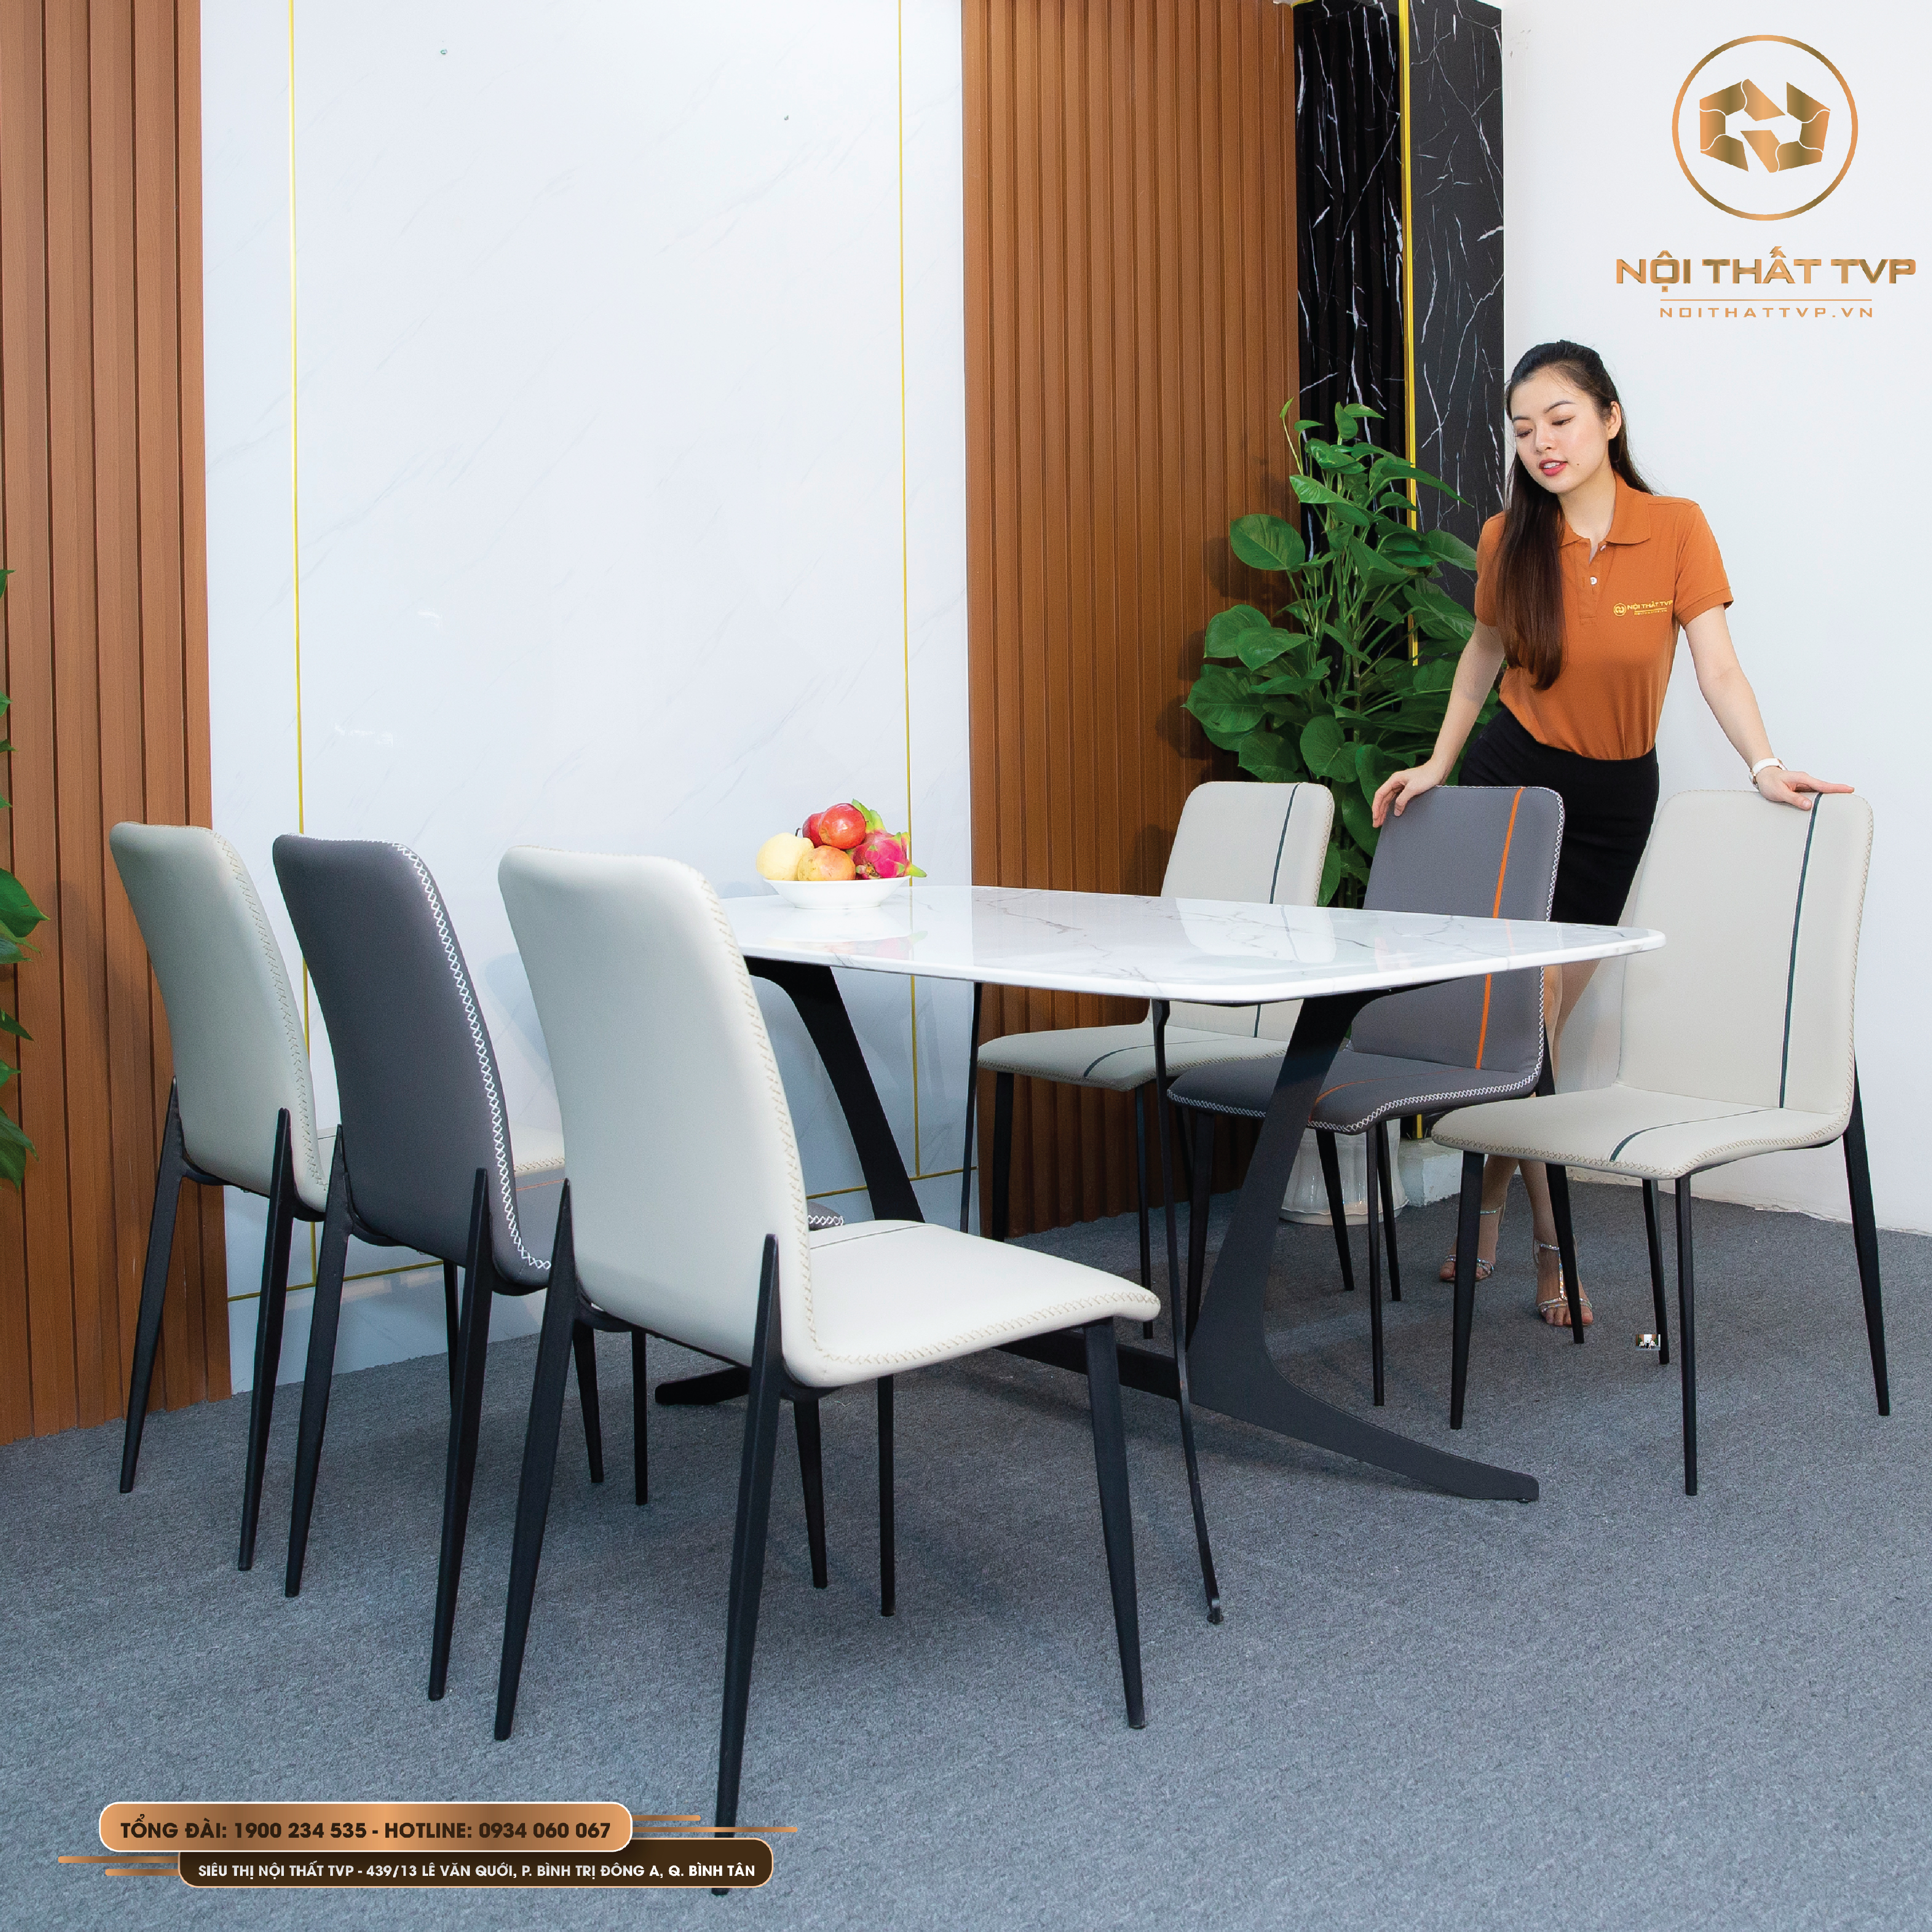 bộ bàn ăn 6 ghế tvp20120